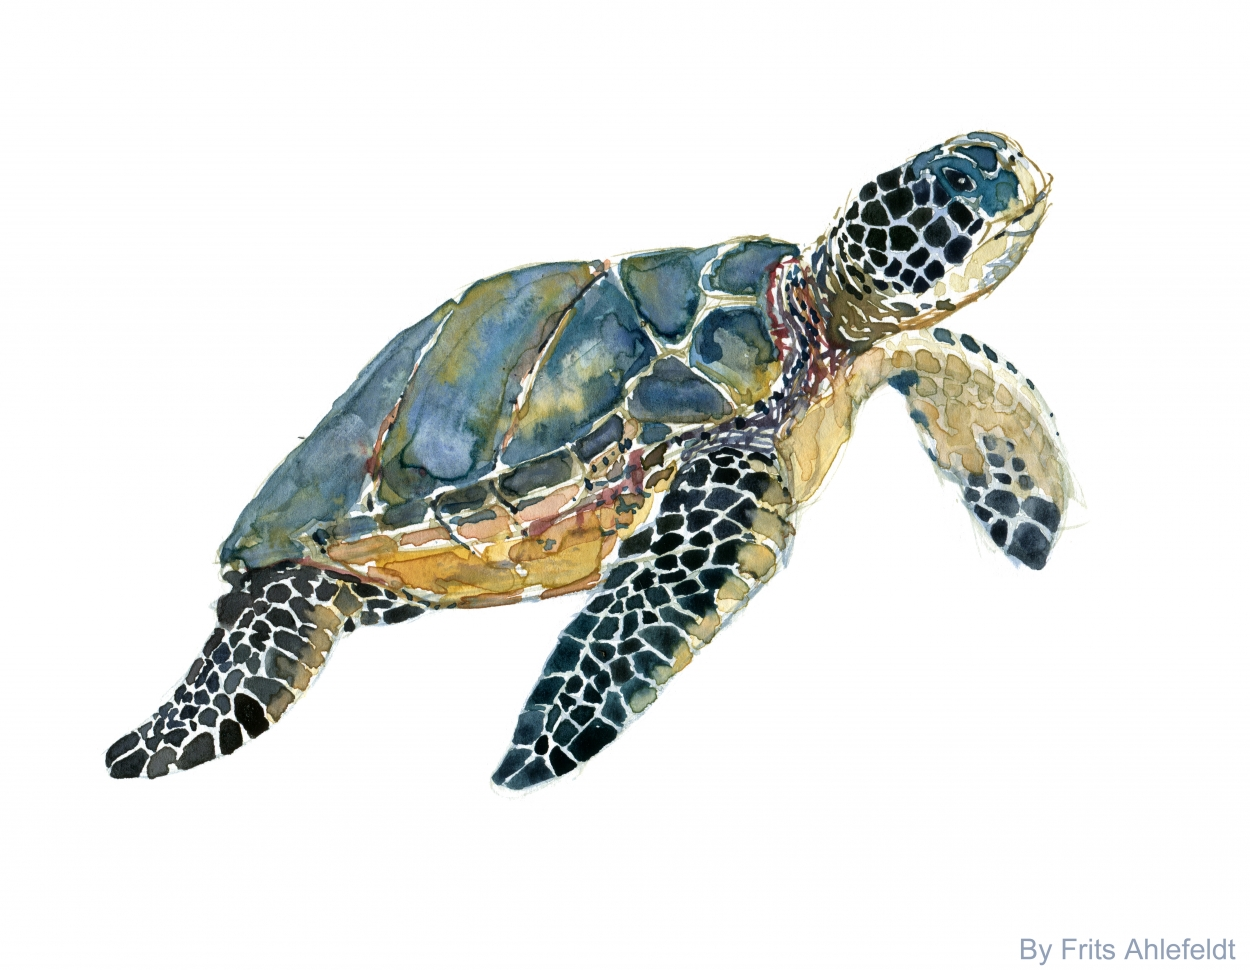 Watercolor of a Sea turtle